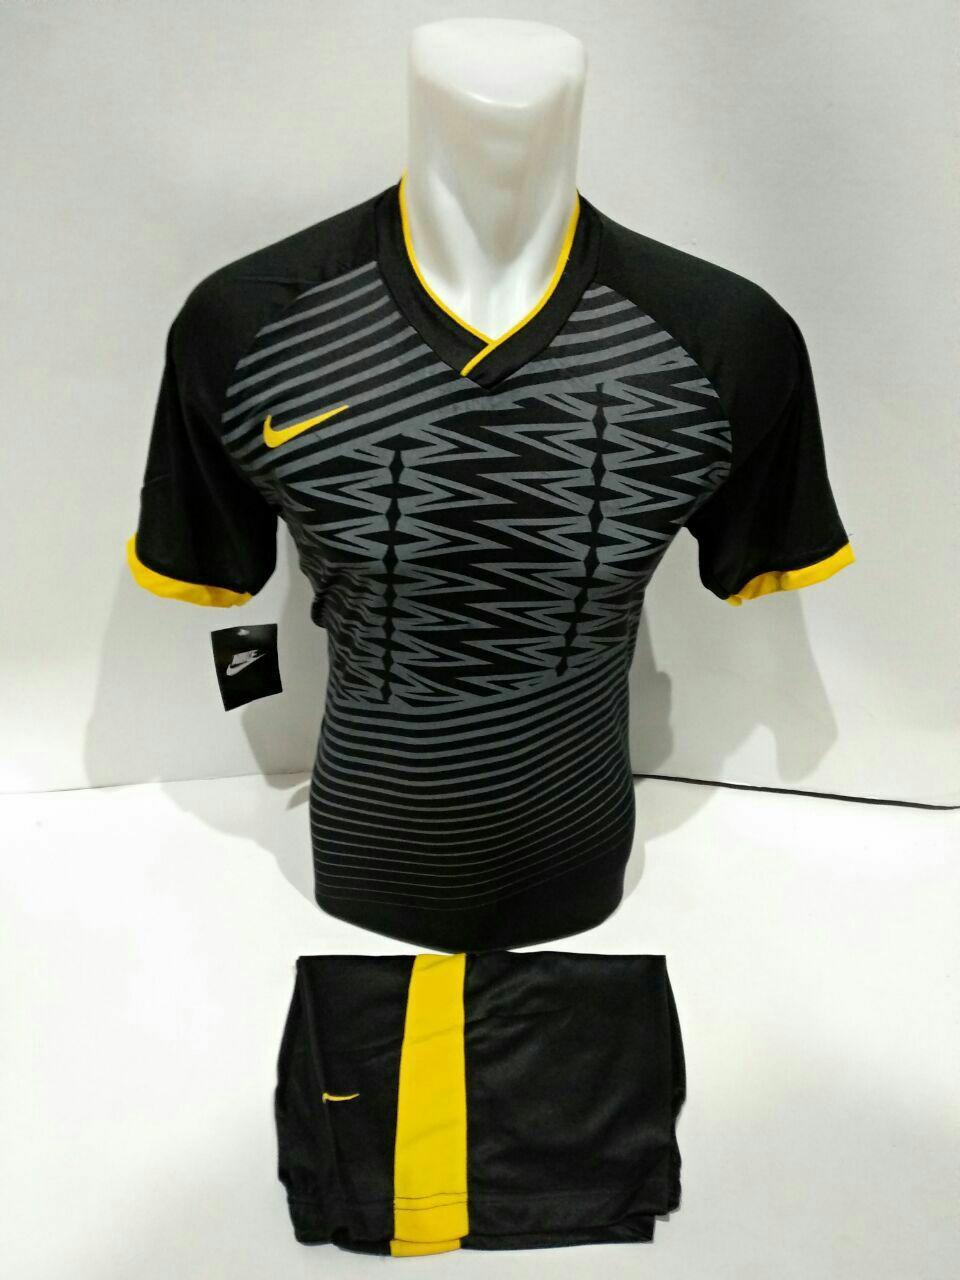 Baju Kaos Olahraga Jersey Setelan Futsal Volly NK 03 Hitam Kuning